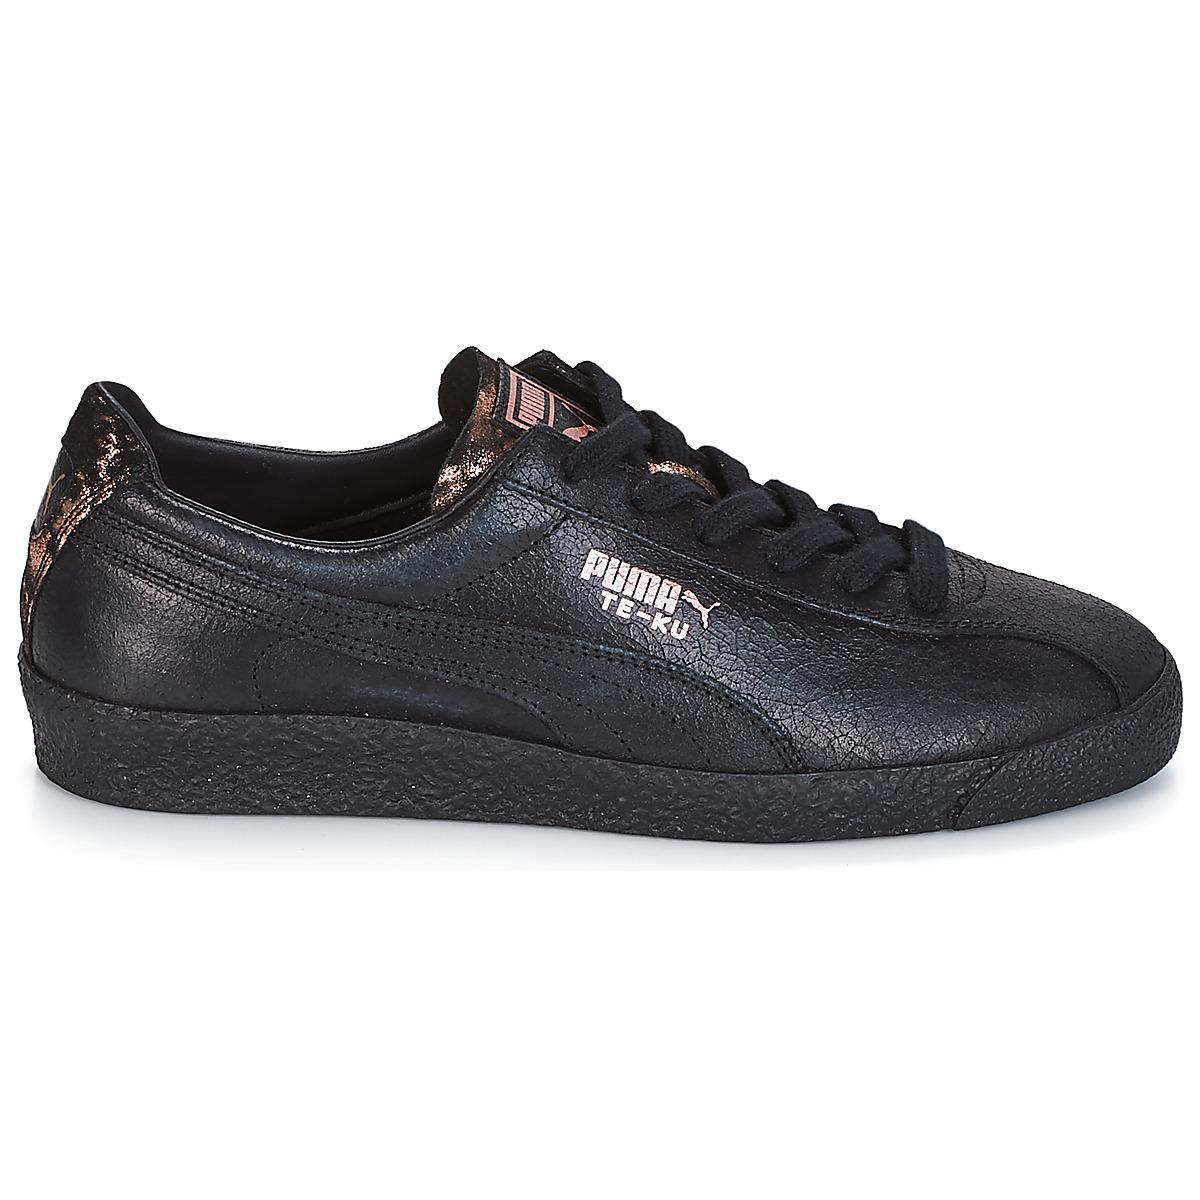 trainers Puma Black black Blac In Artica Women's Shoes Ku Wn Te nqqwHR8Bgp